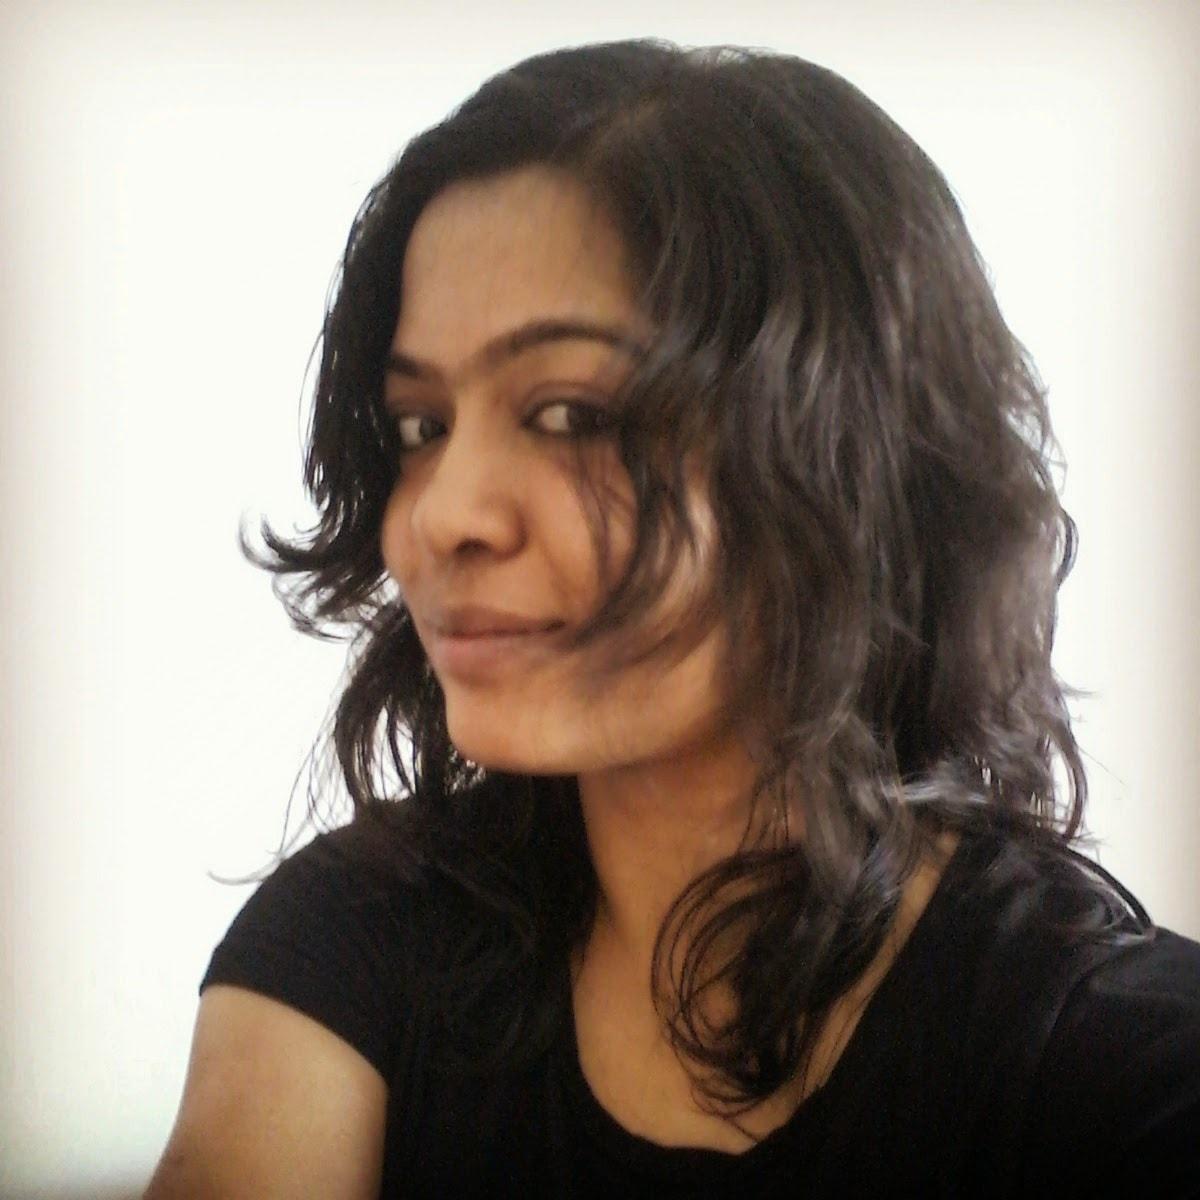 Shohini from Kolkata